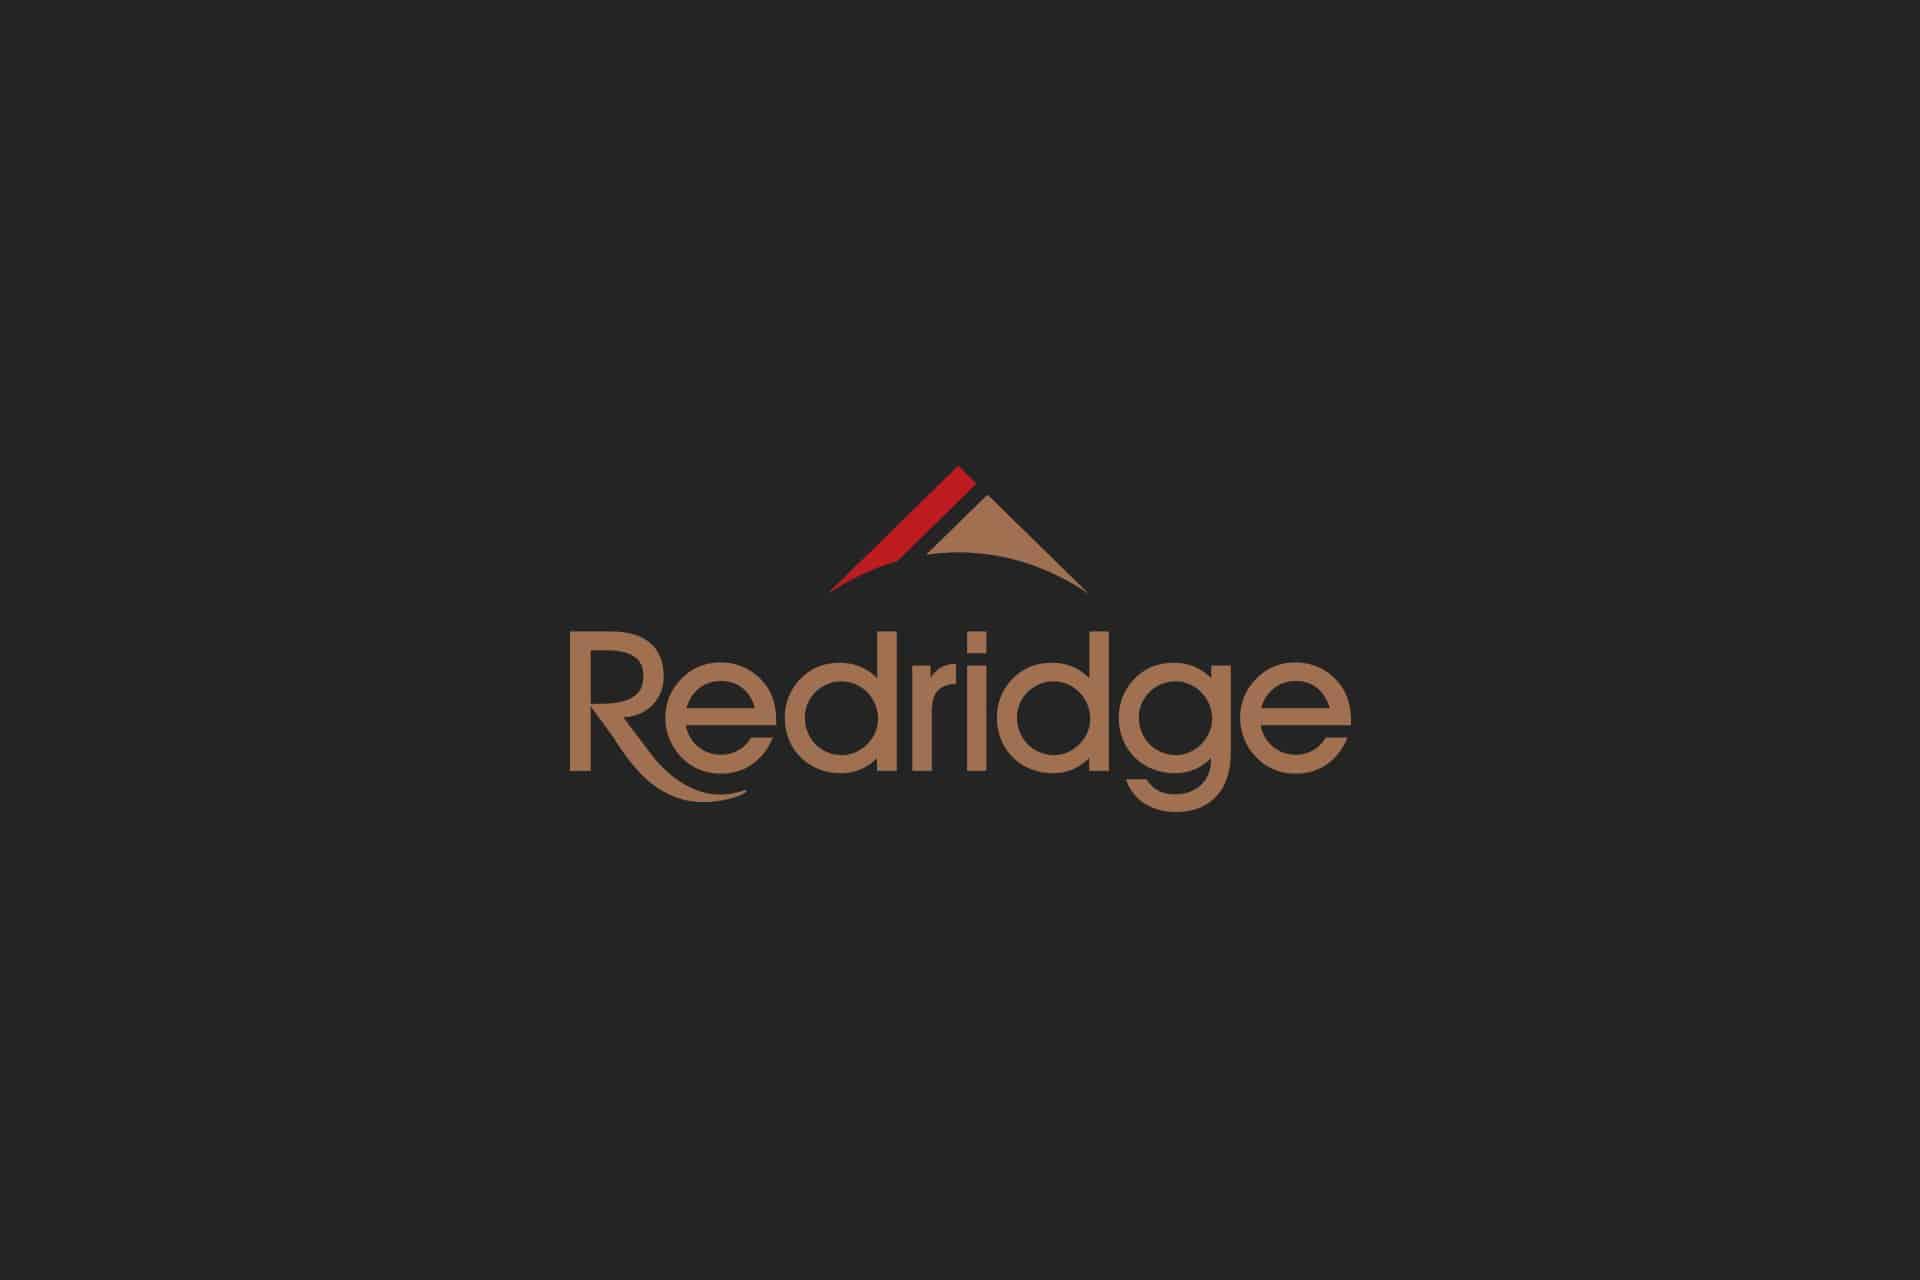 redridge-logo-design2